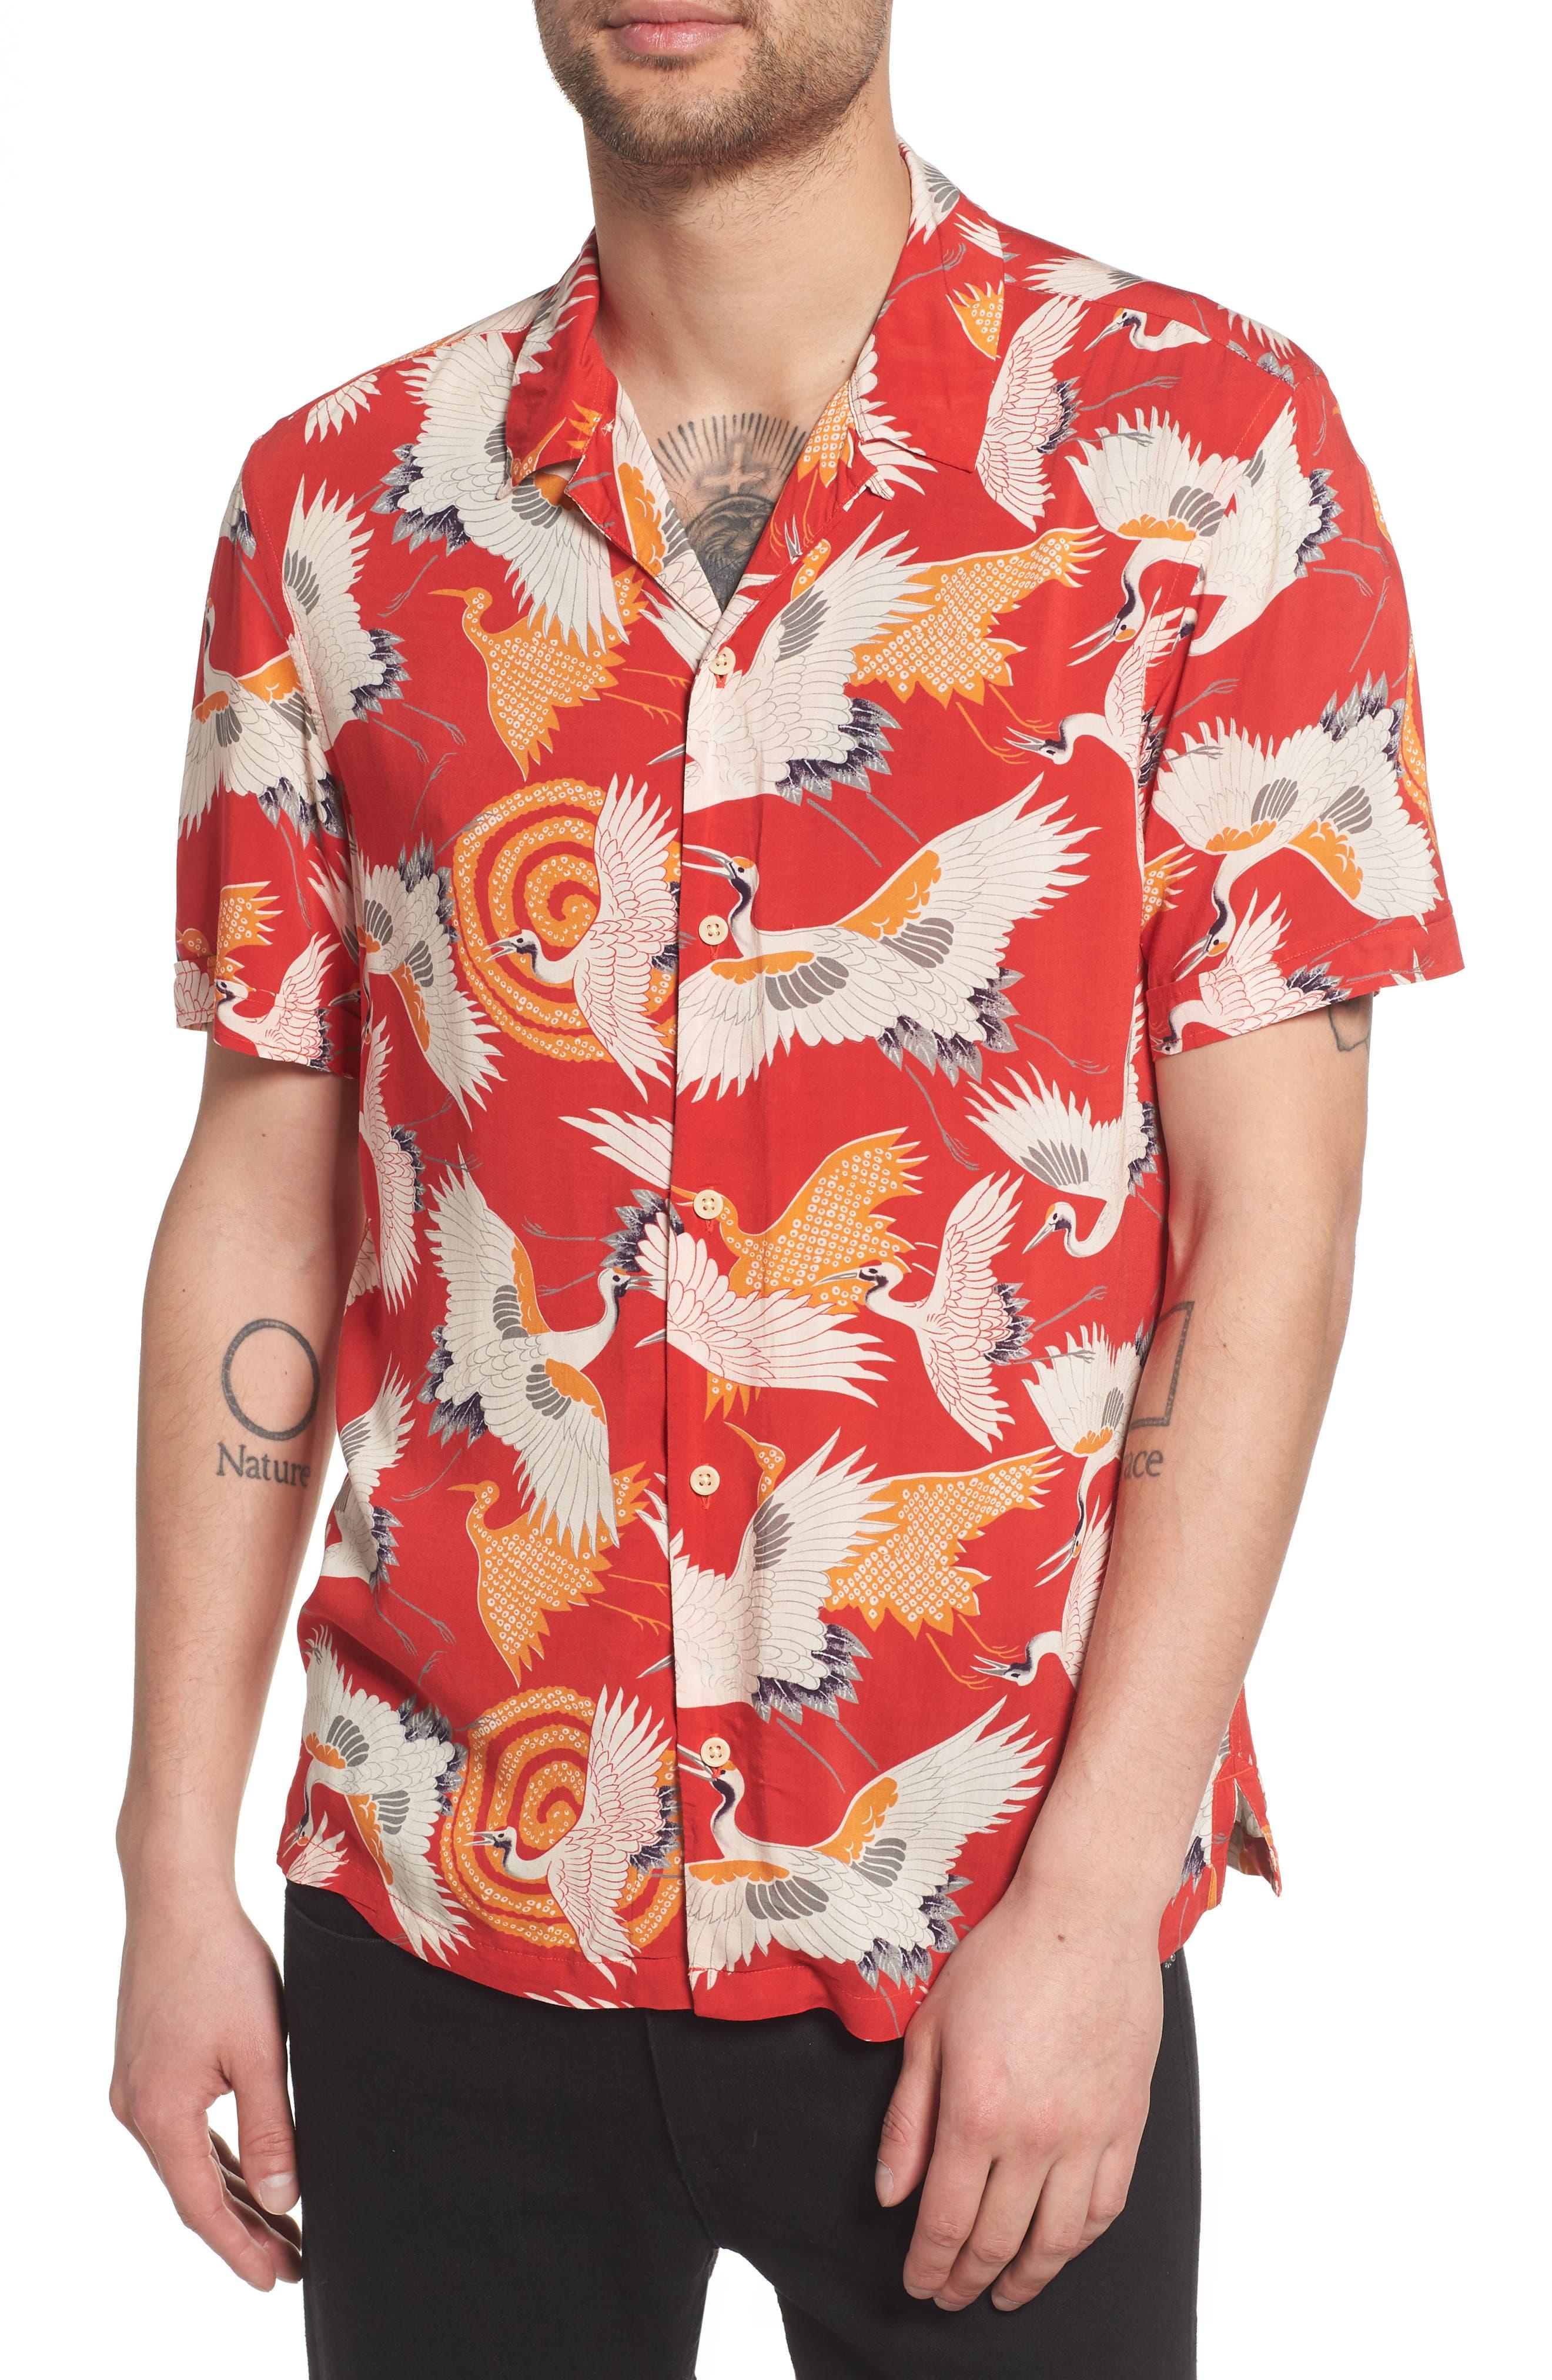 Tsuru Regular Fit Short Sleeve Sport Shirt,                             Main thumbnail 1, color,                             600